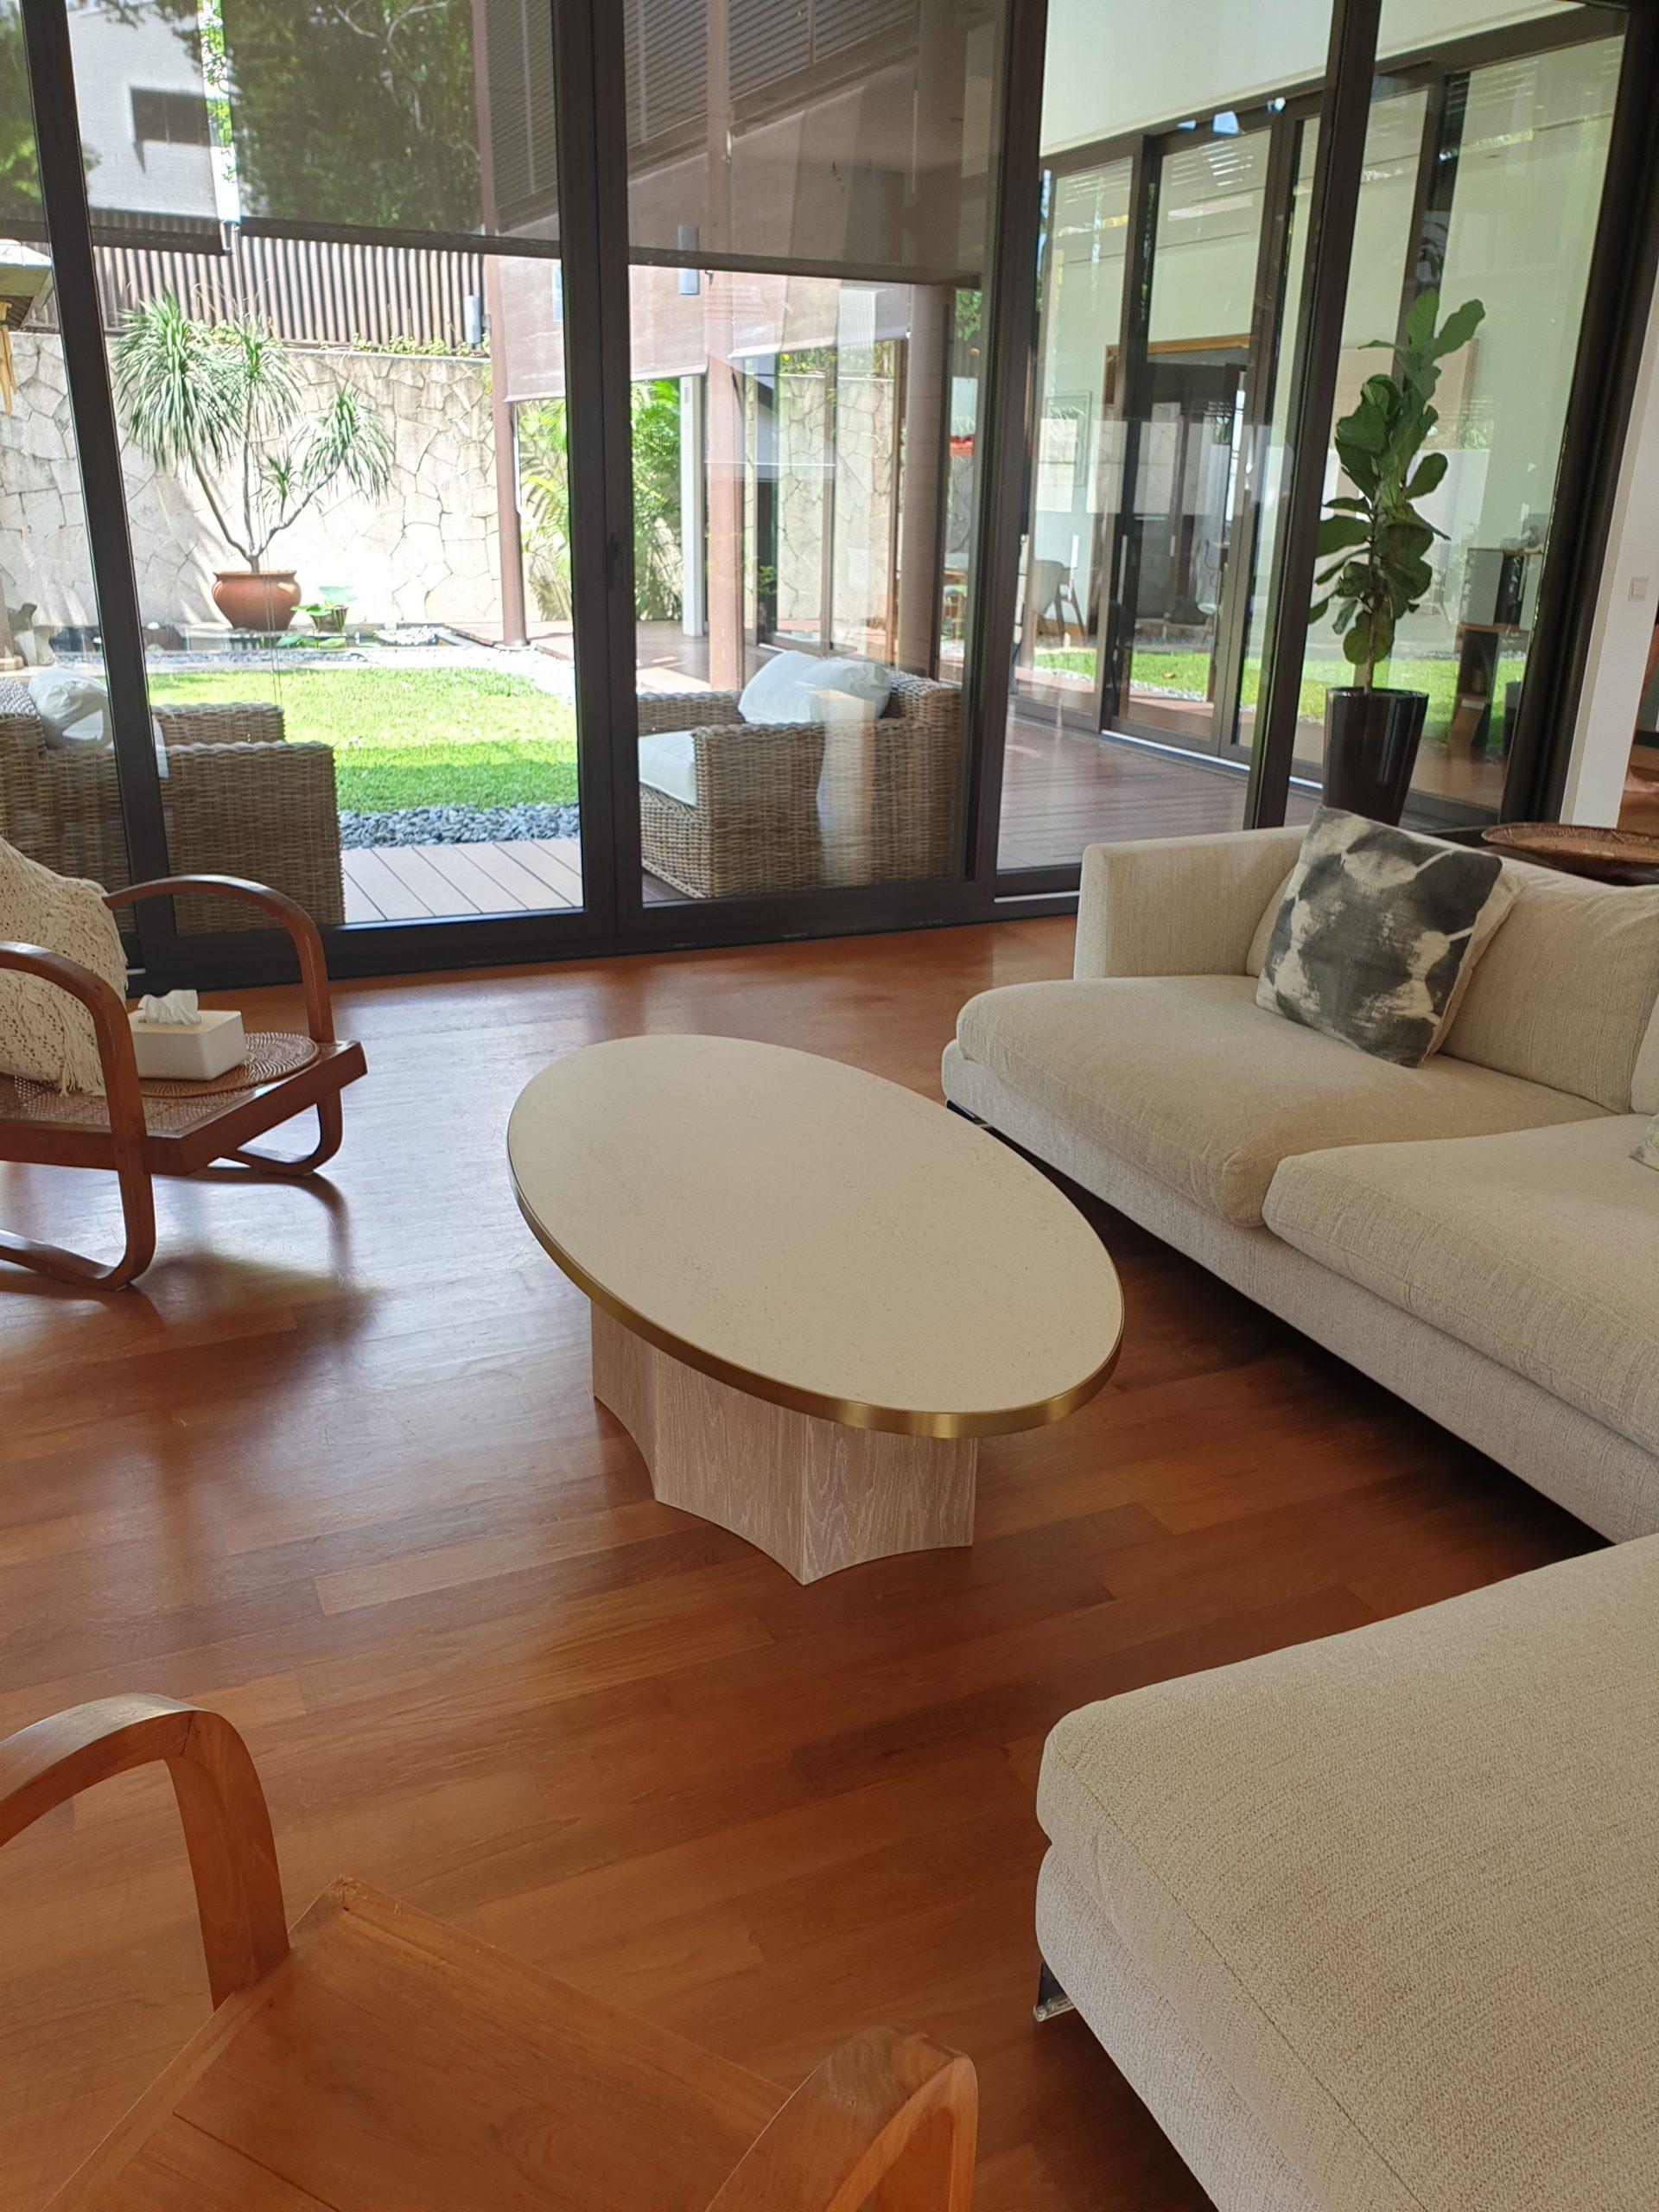 Ocho Coffee Table 1450L x 750W x 400H, Dekton, Danae, Oak, White wash, SS, Gold (3)